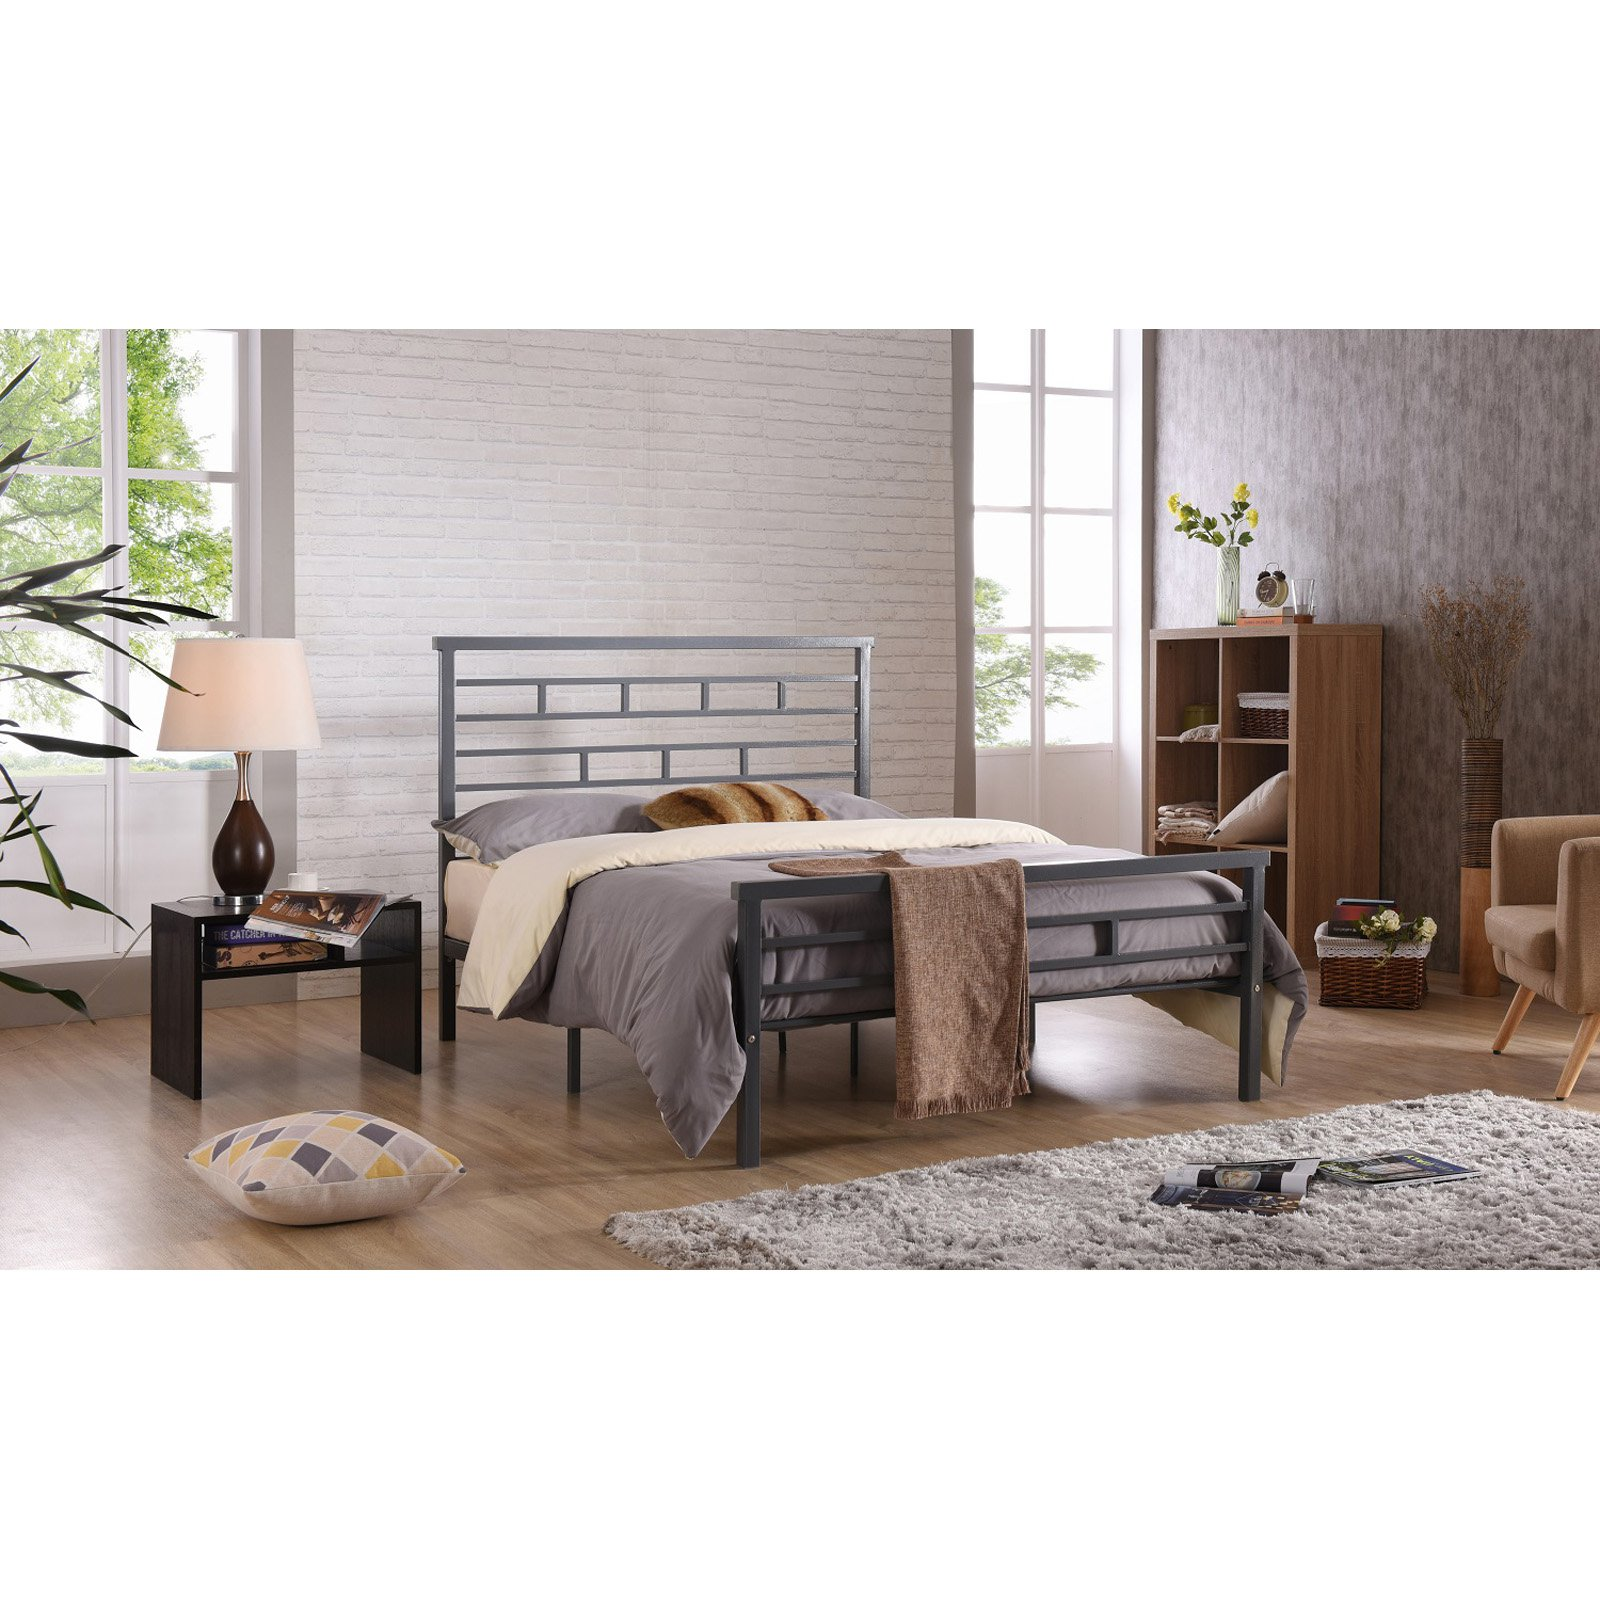 Hodedah Imports Rectangular Metal Platform Bed